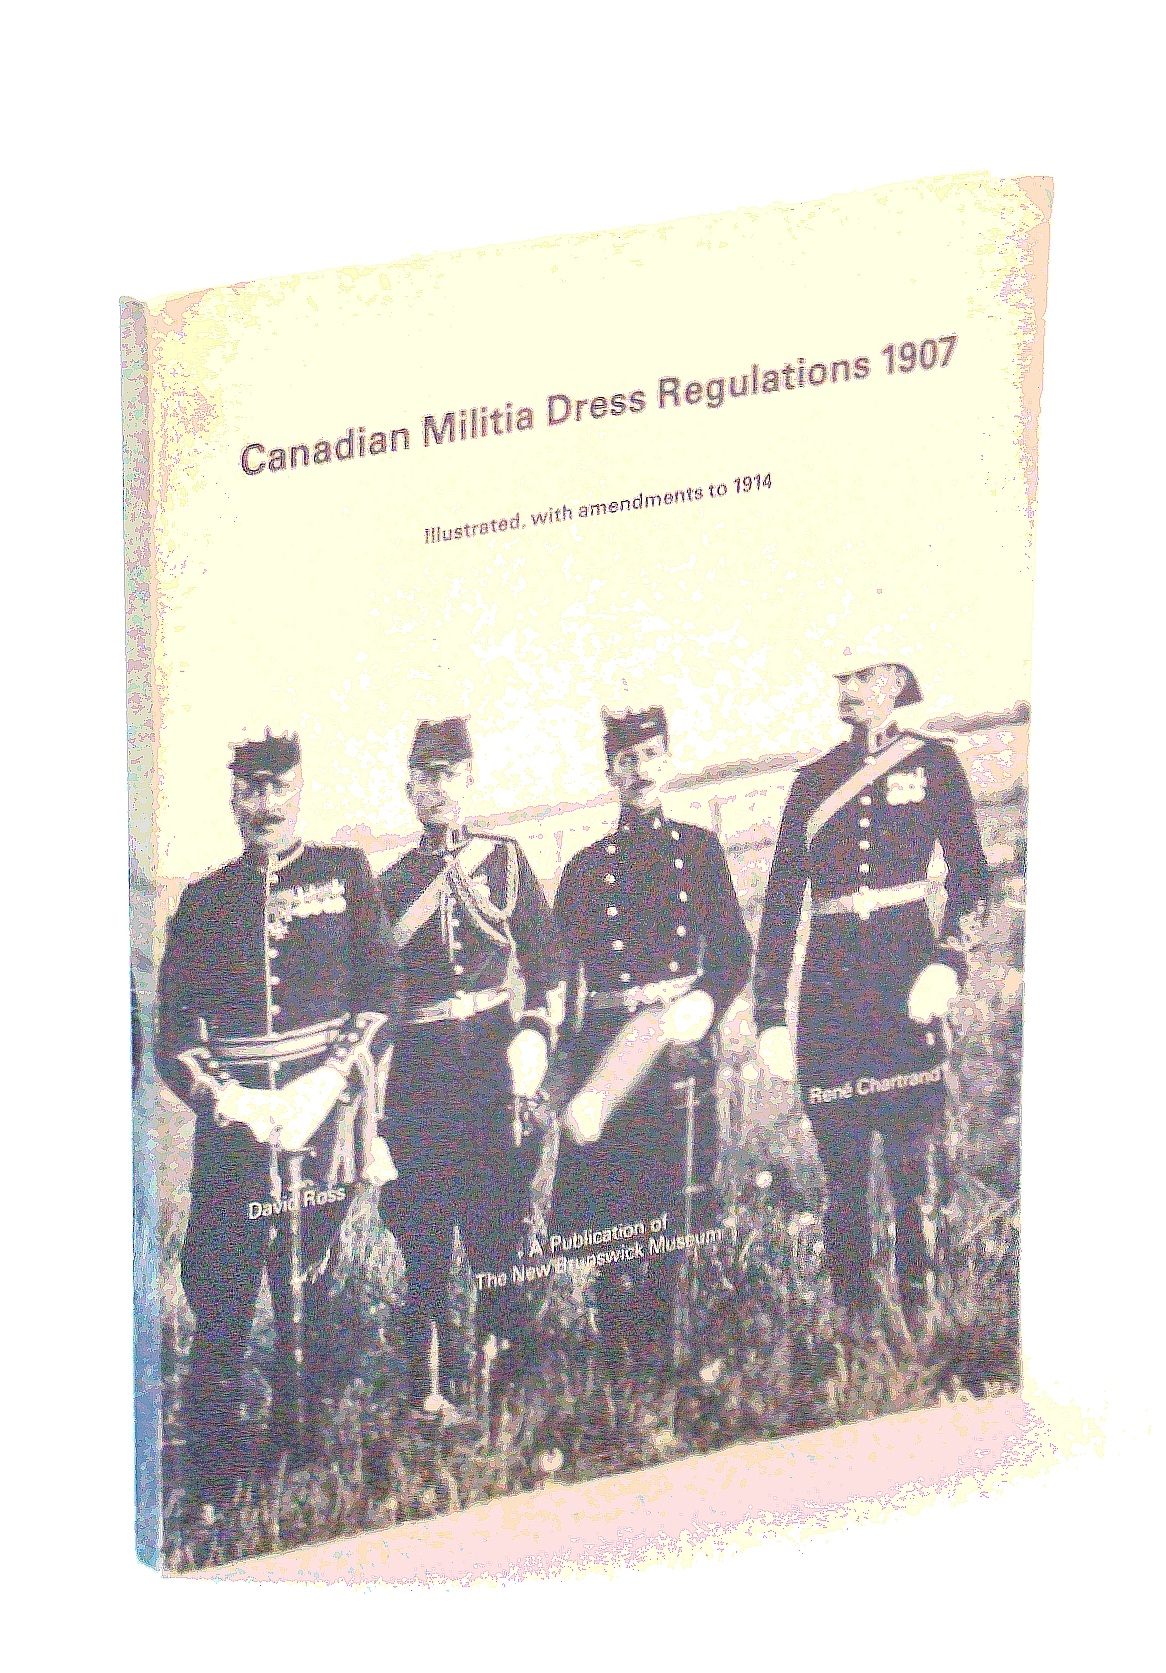 Canadian Militia Dress Regulations, 1907, Illustrated, with Amendments to 1914